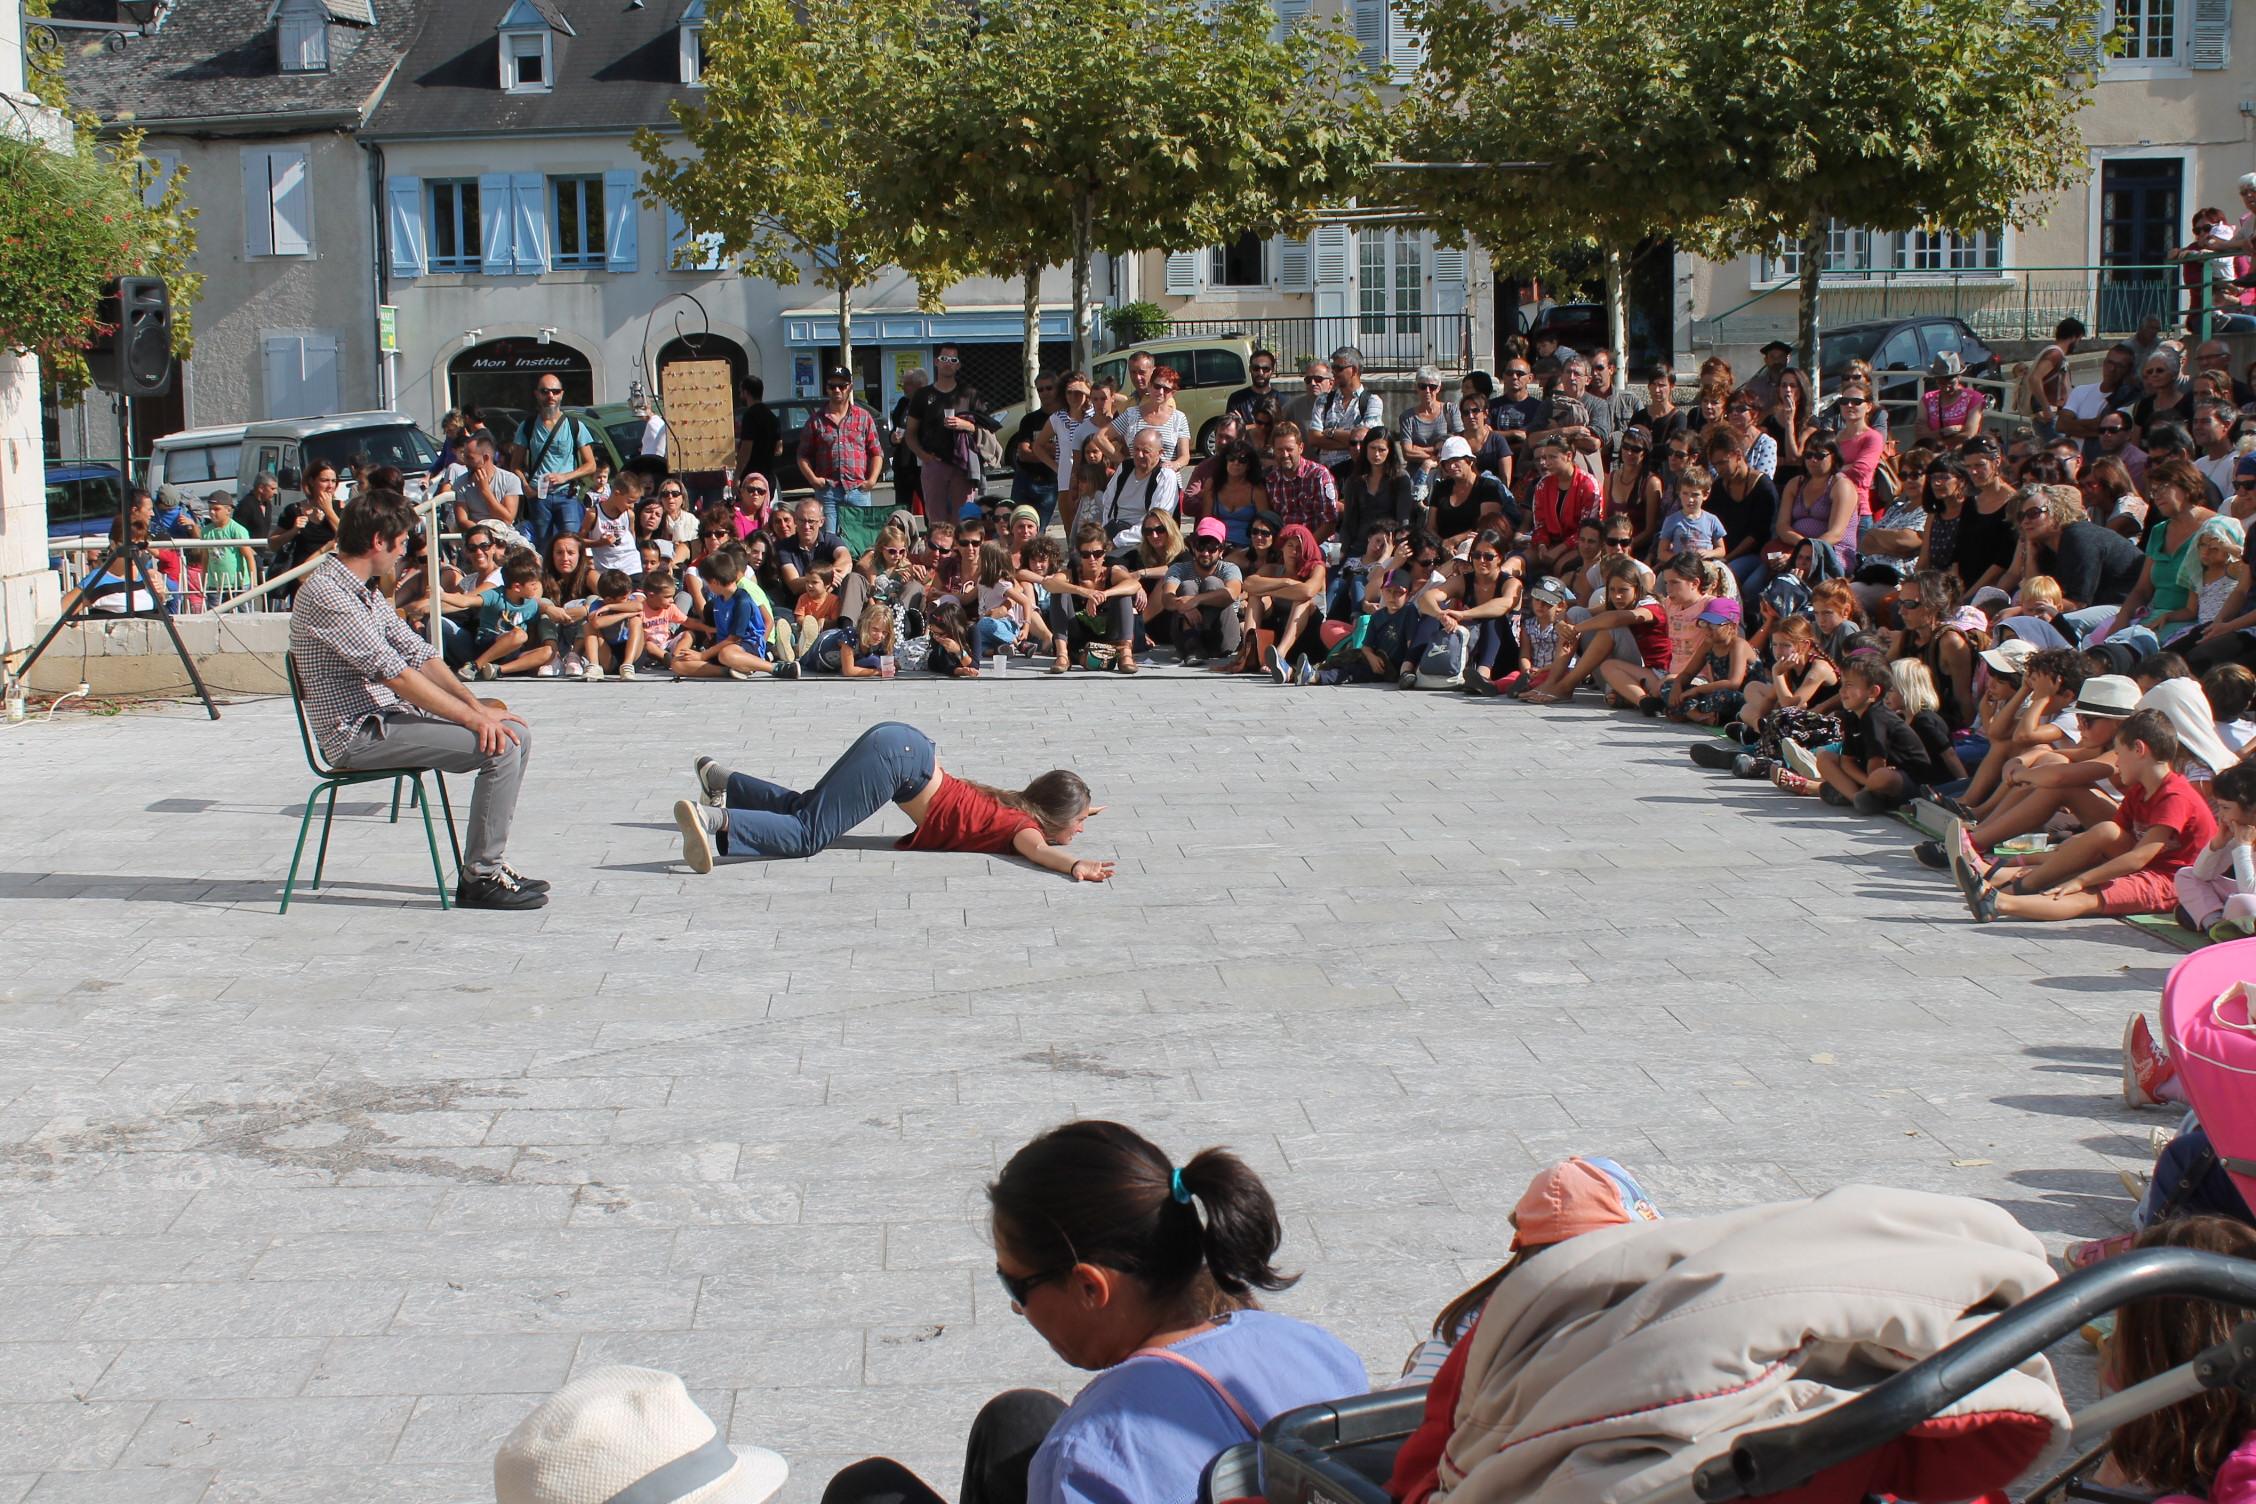 Festival Lacabanne des arts - MONEIN